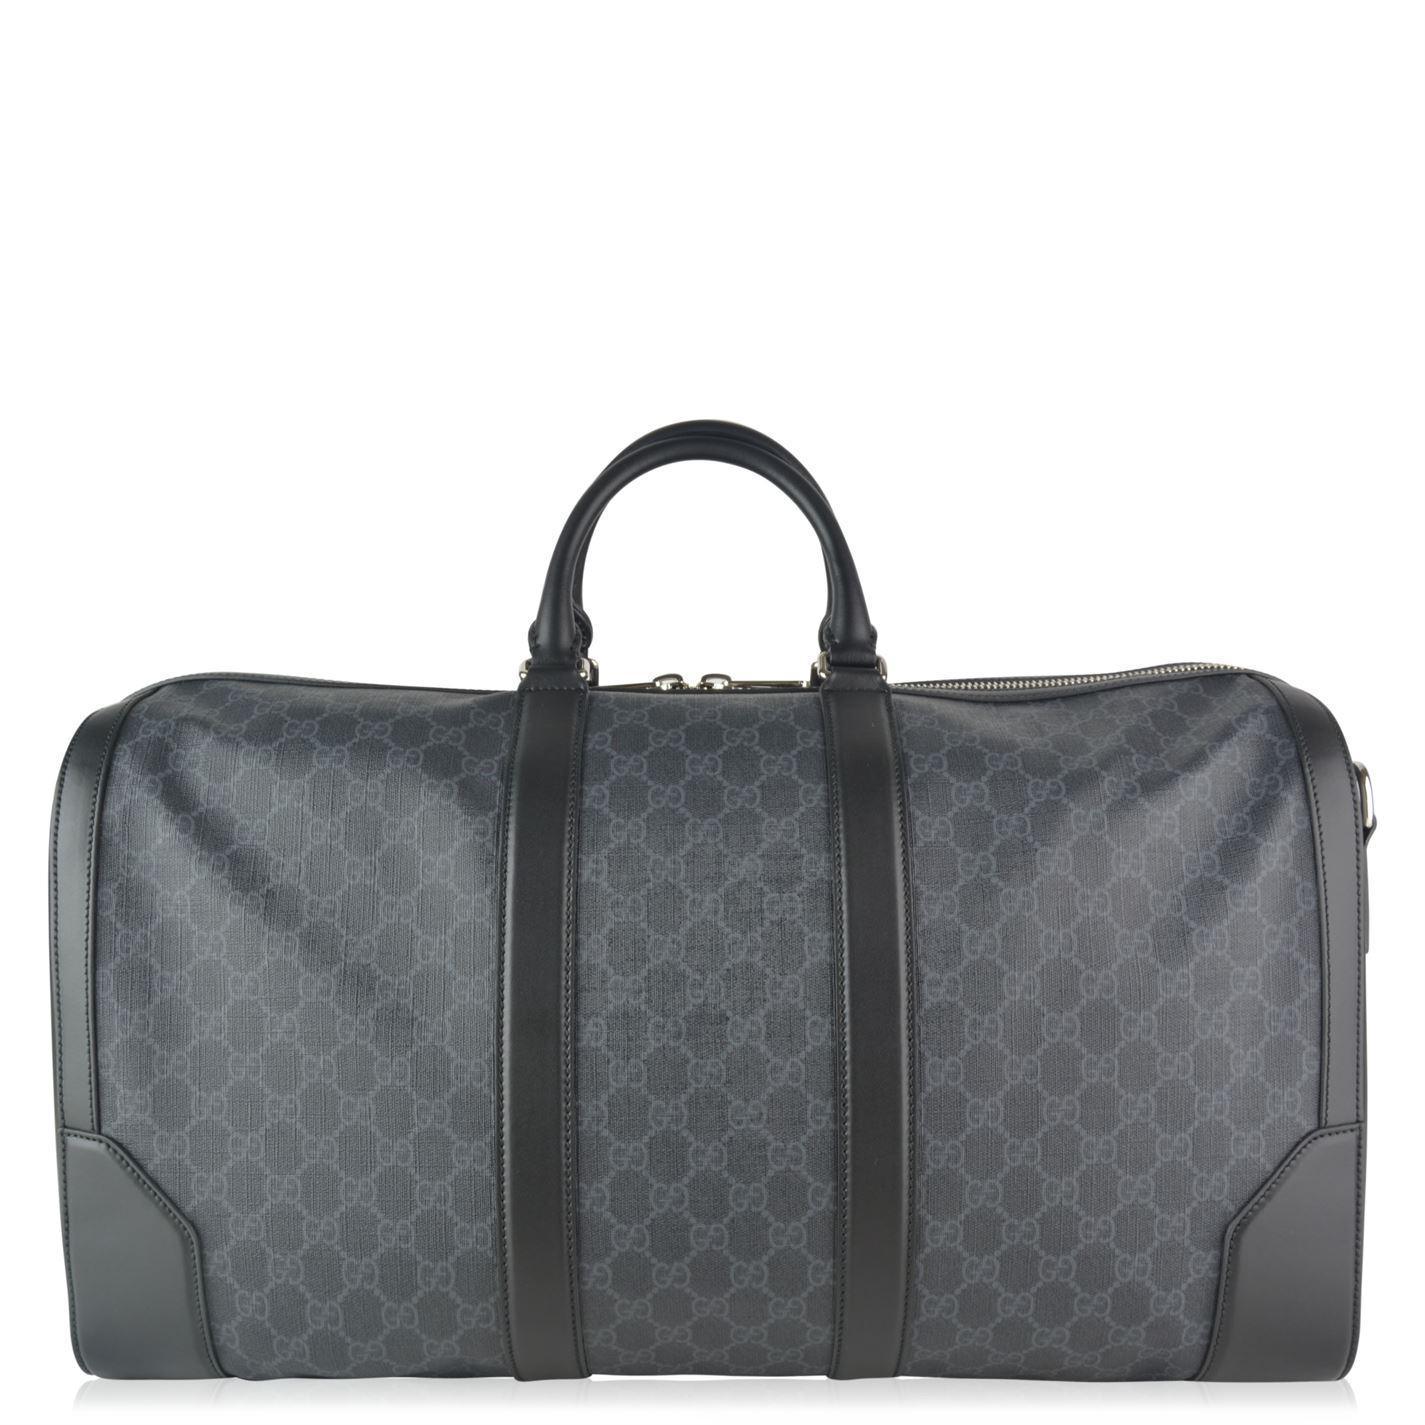 b96c38222c2c Gucci - Black Soft Gg Supreme Carry On Duffle Bag - Lyst. View fullscreen